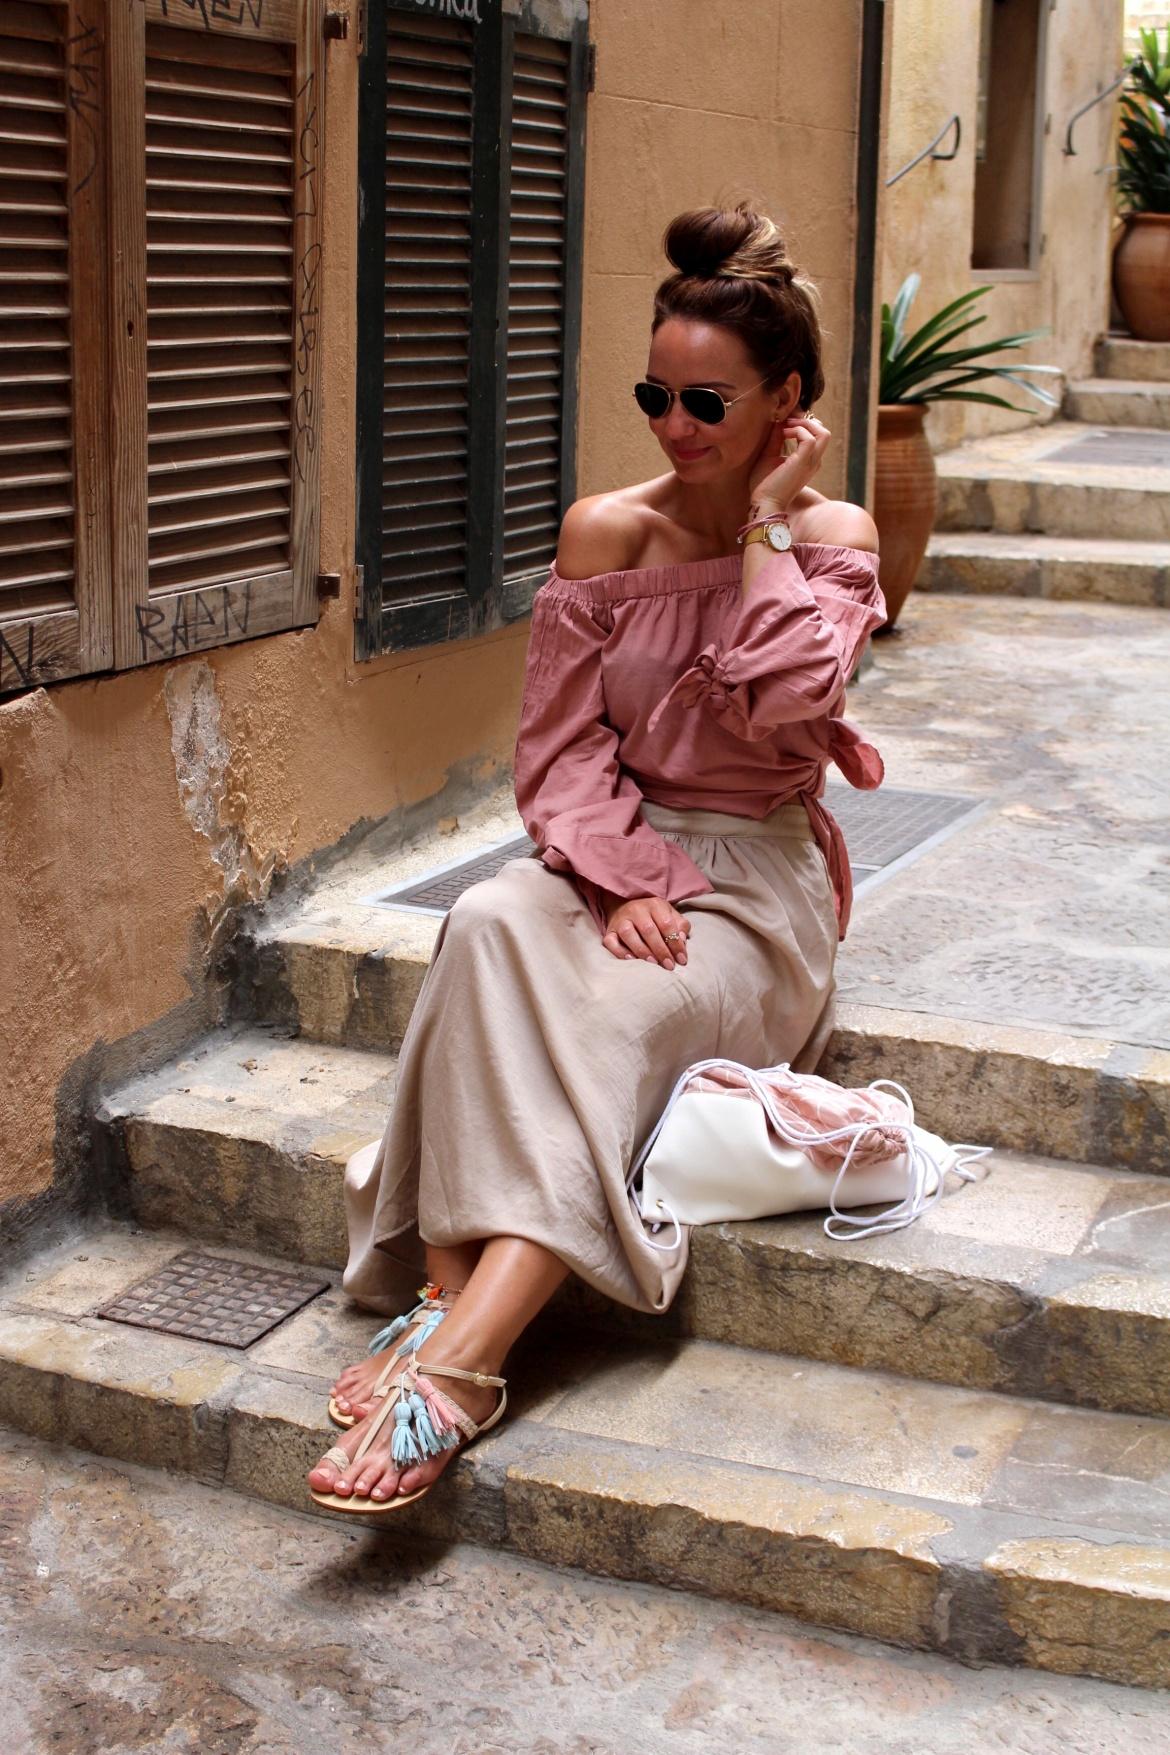 Fashioncircuz by Jenny maxirock-fashionblogger-1170x1755 IM RÖCKCHEN DURCH PALMA DE MALLORCA